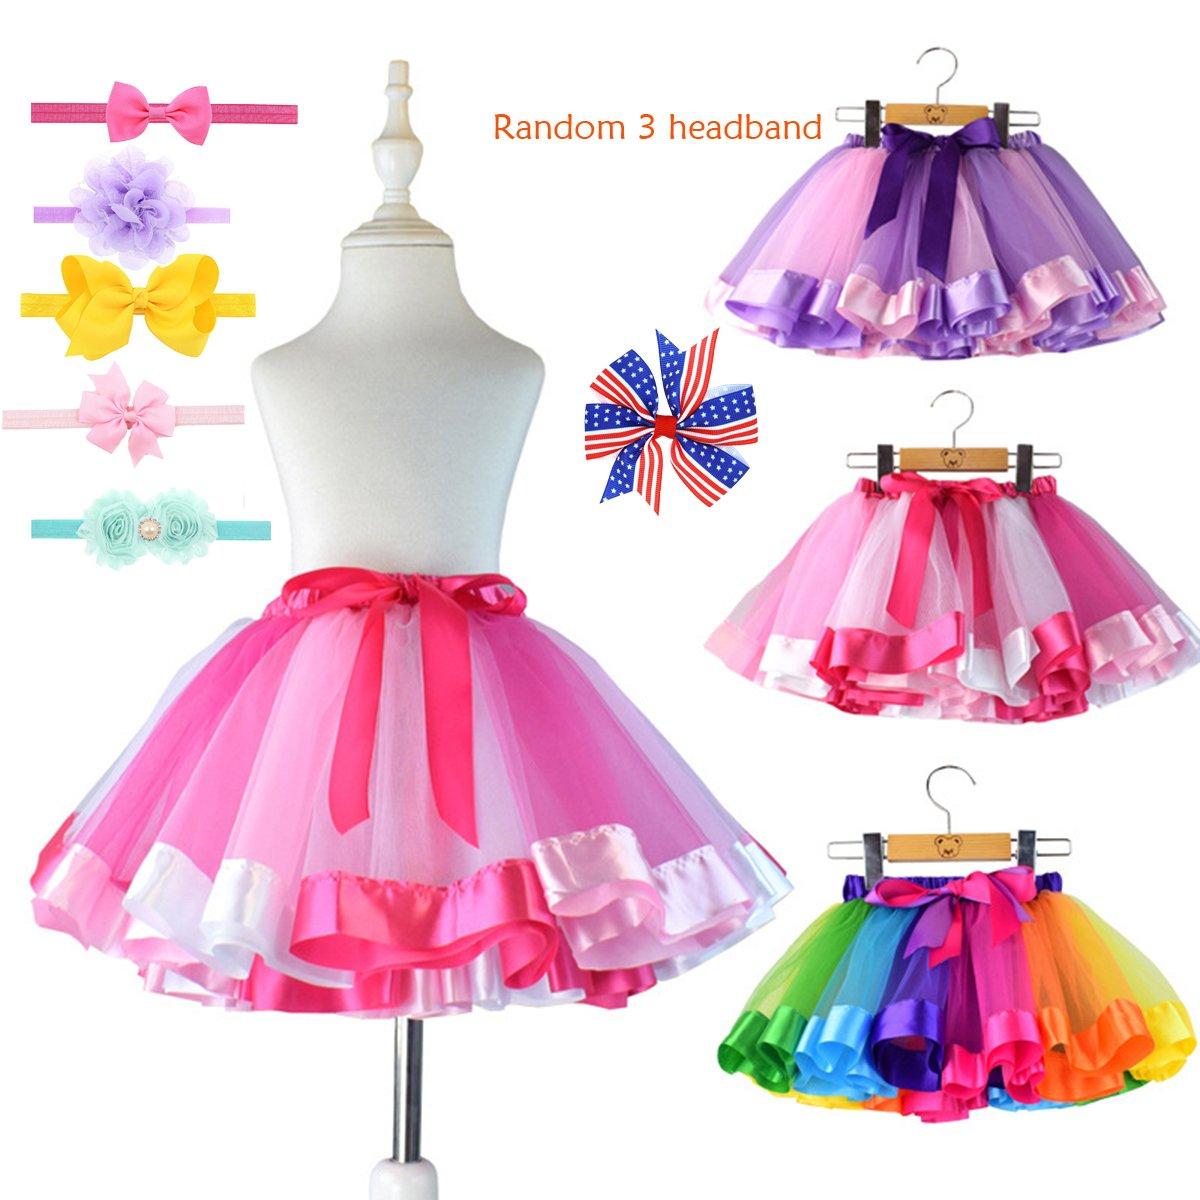 Girls Tutu Skirt Layered Rainbow Bow Dance Party Princess Dress Homdar Direct